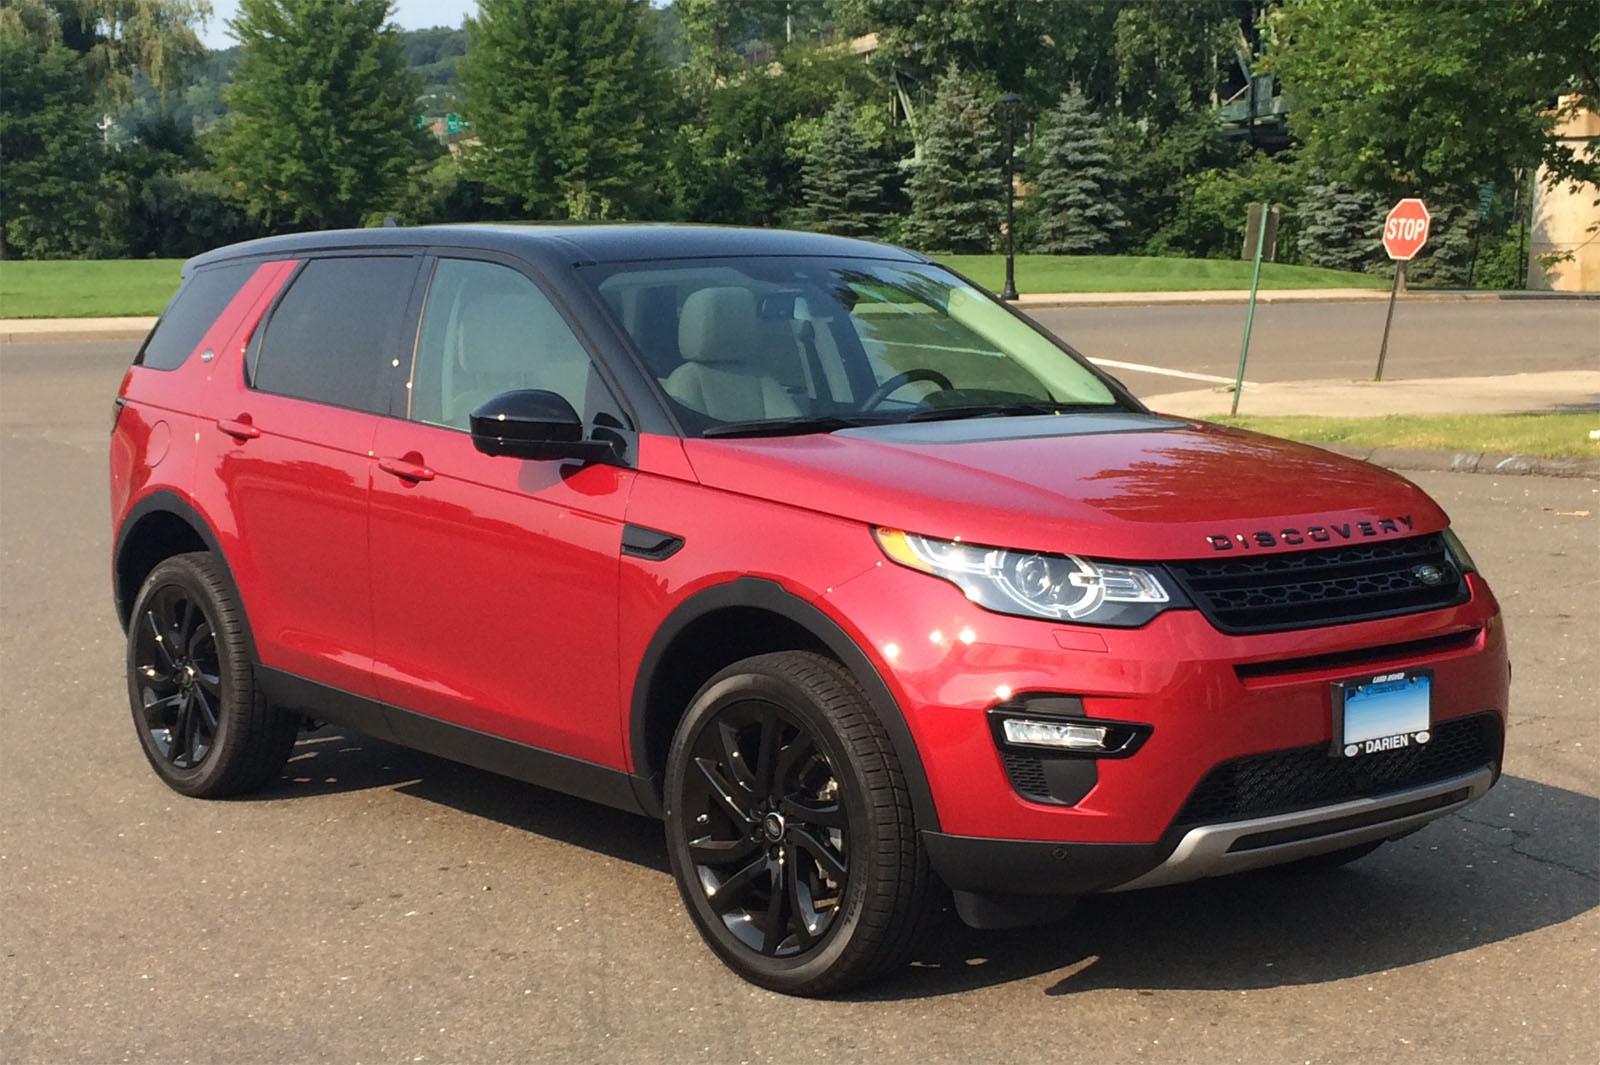 Range Rover Discovery Sport Black >> Firenze Red Discovery Sport Photo Thread - Land Rover Discovery Sport Forum